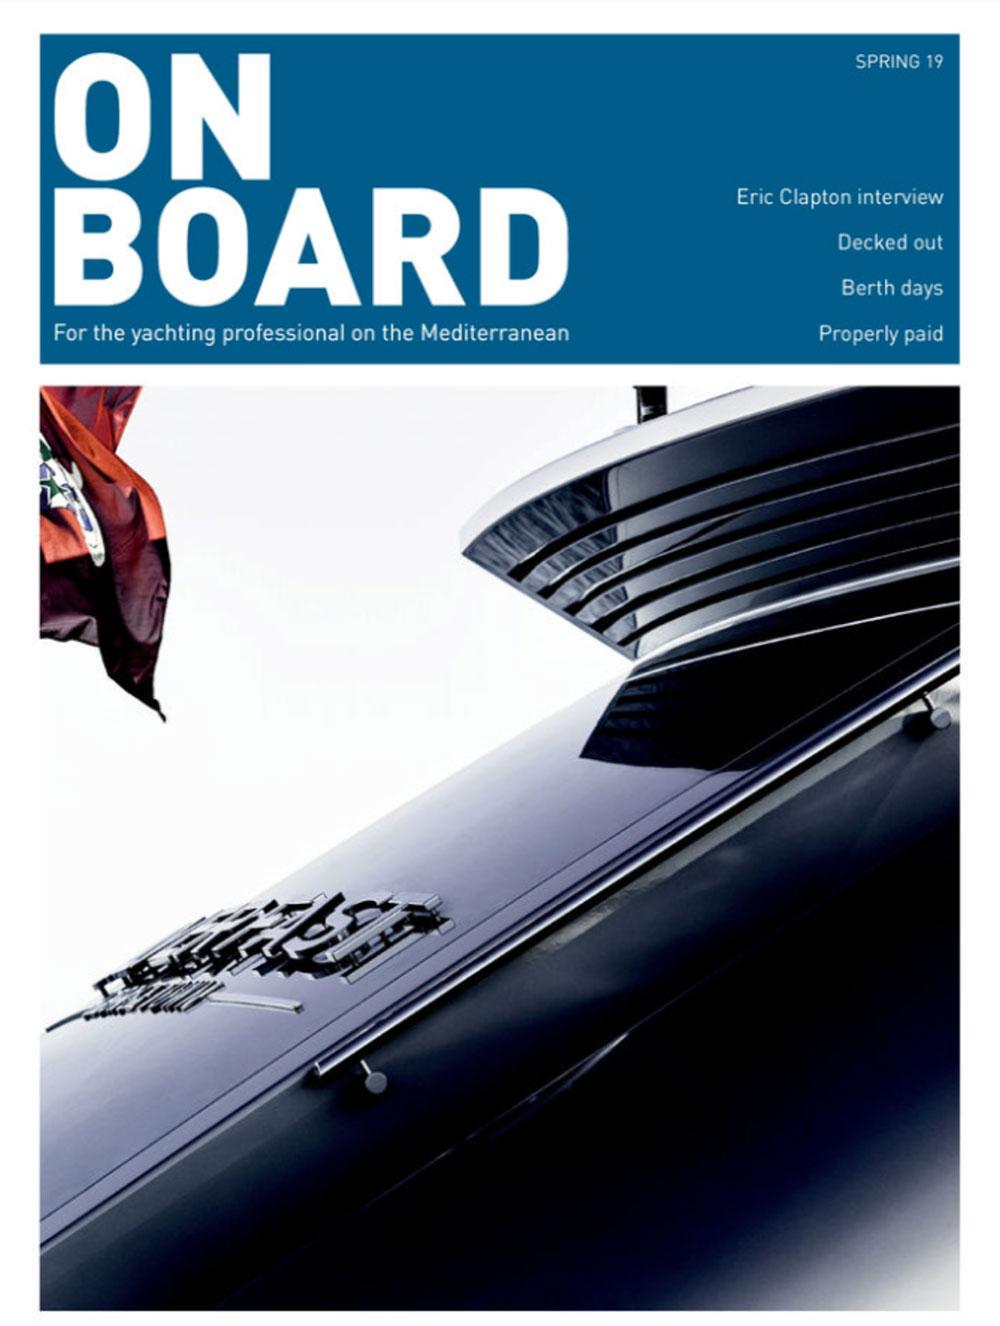 onboard magazine spring